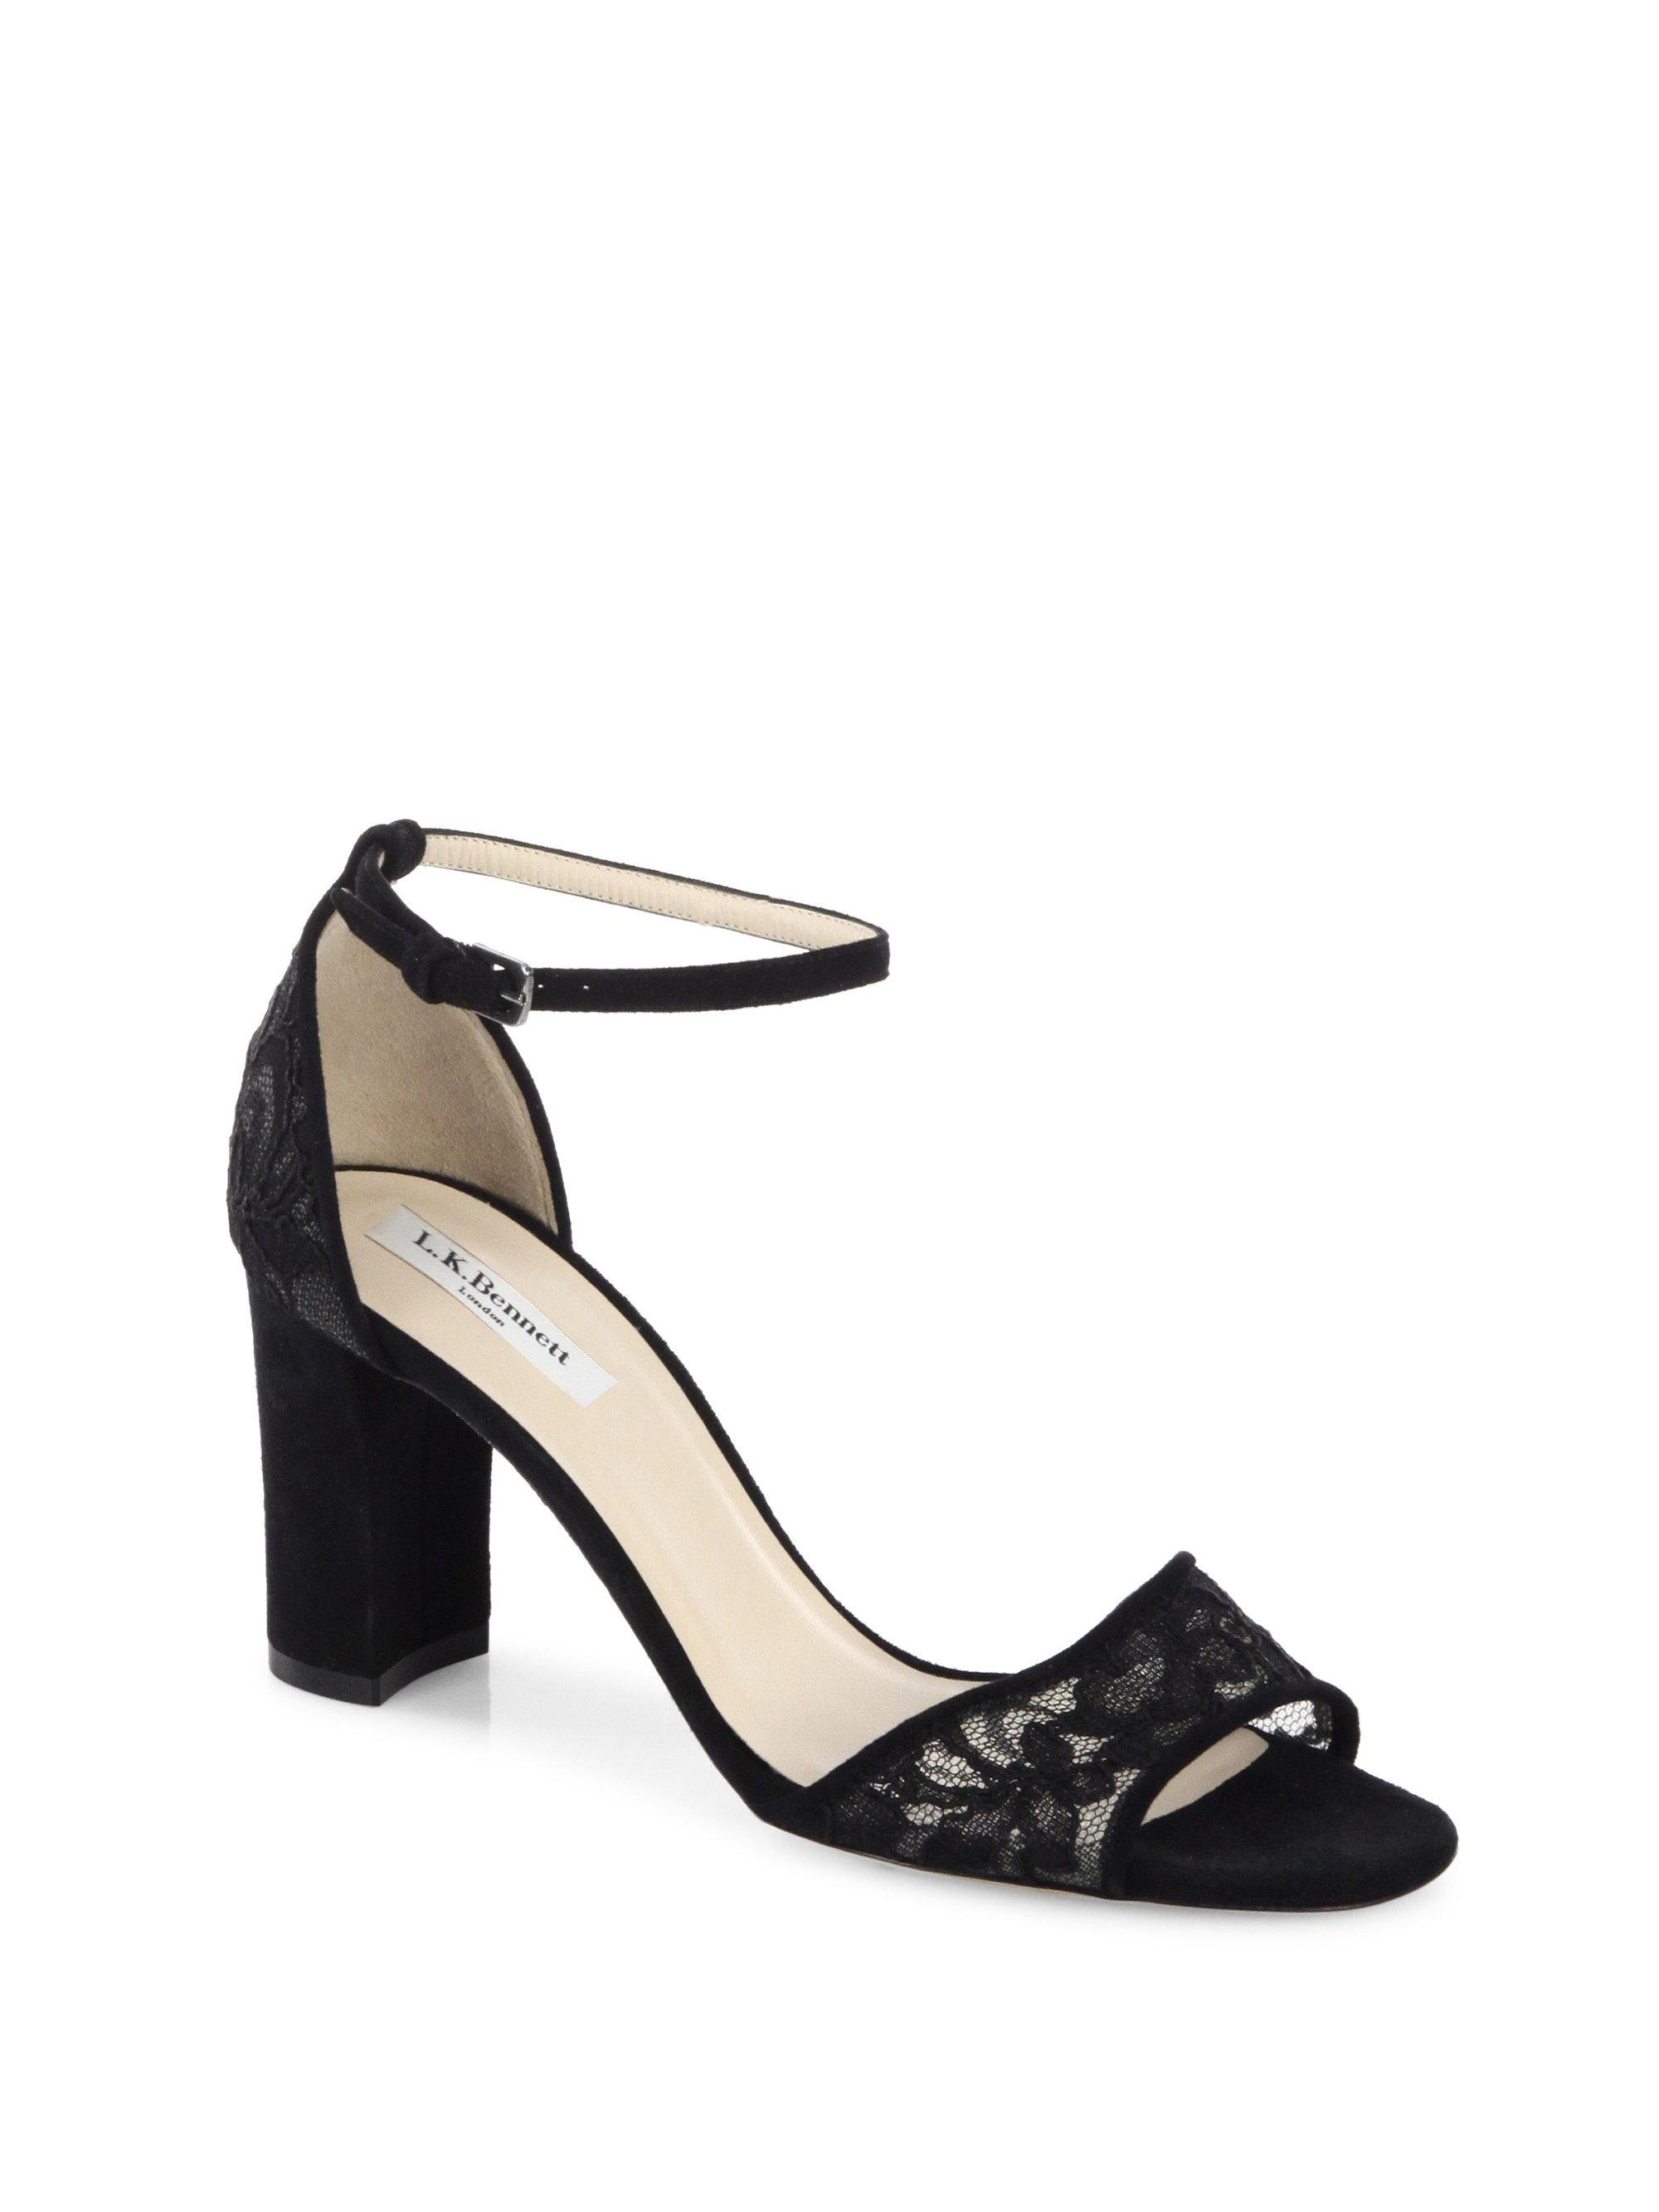 L.K. Bennett Helena Suede Ankle Strap Sandals q0rmtdf